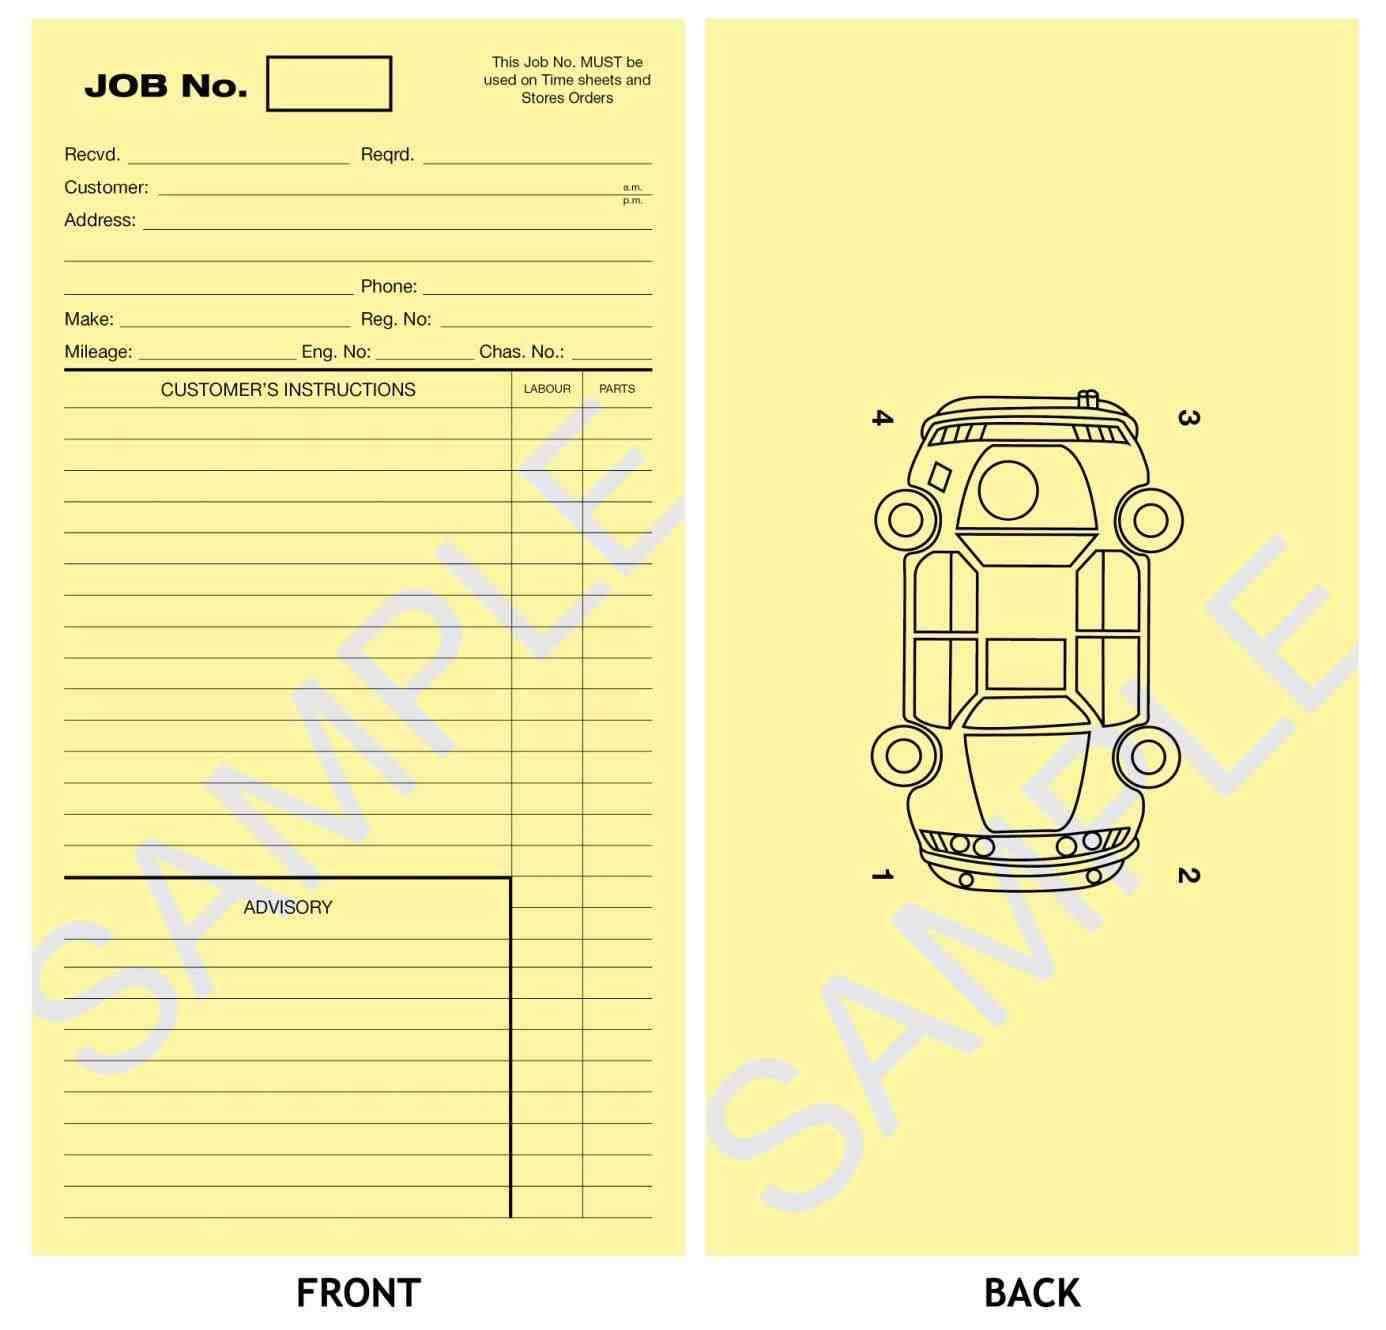 21 Standard Job Card Template Mechanic in Word for Job Card With Regard To Mechanics Job Card Template